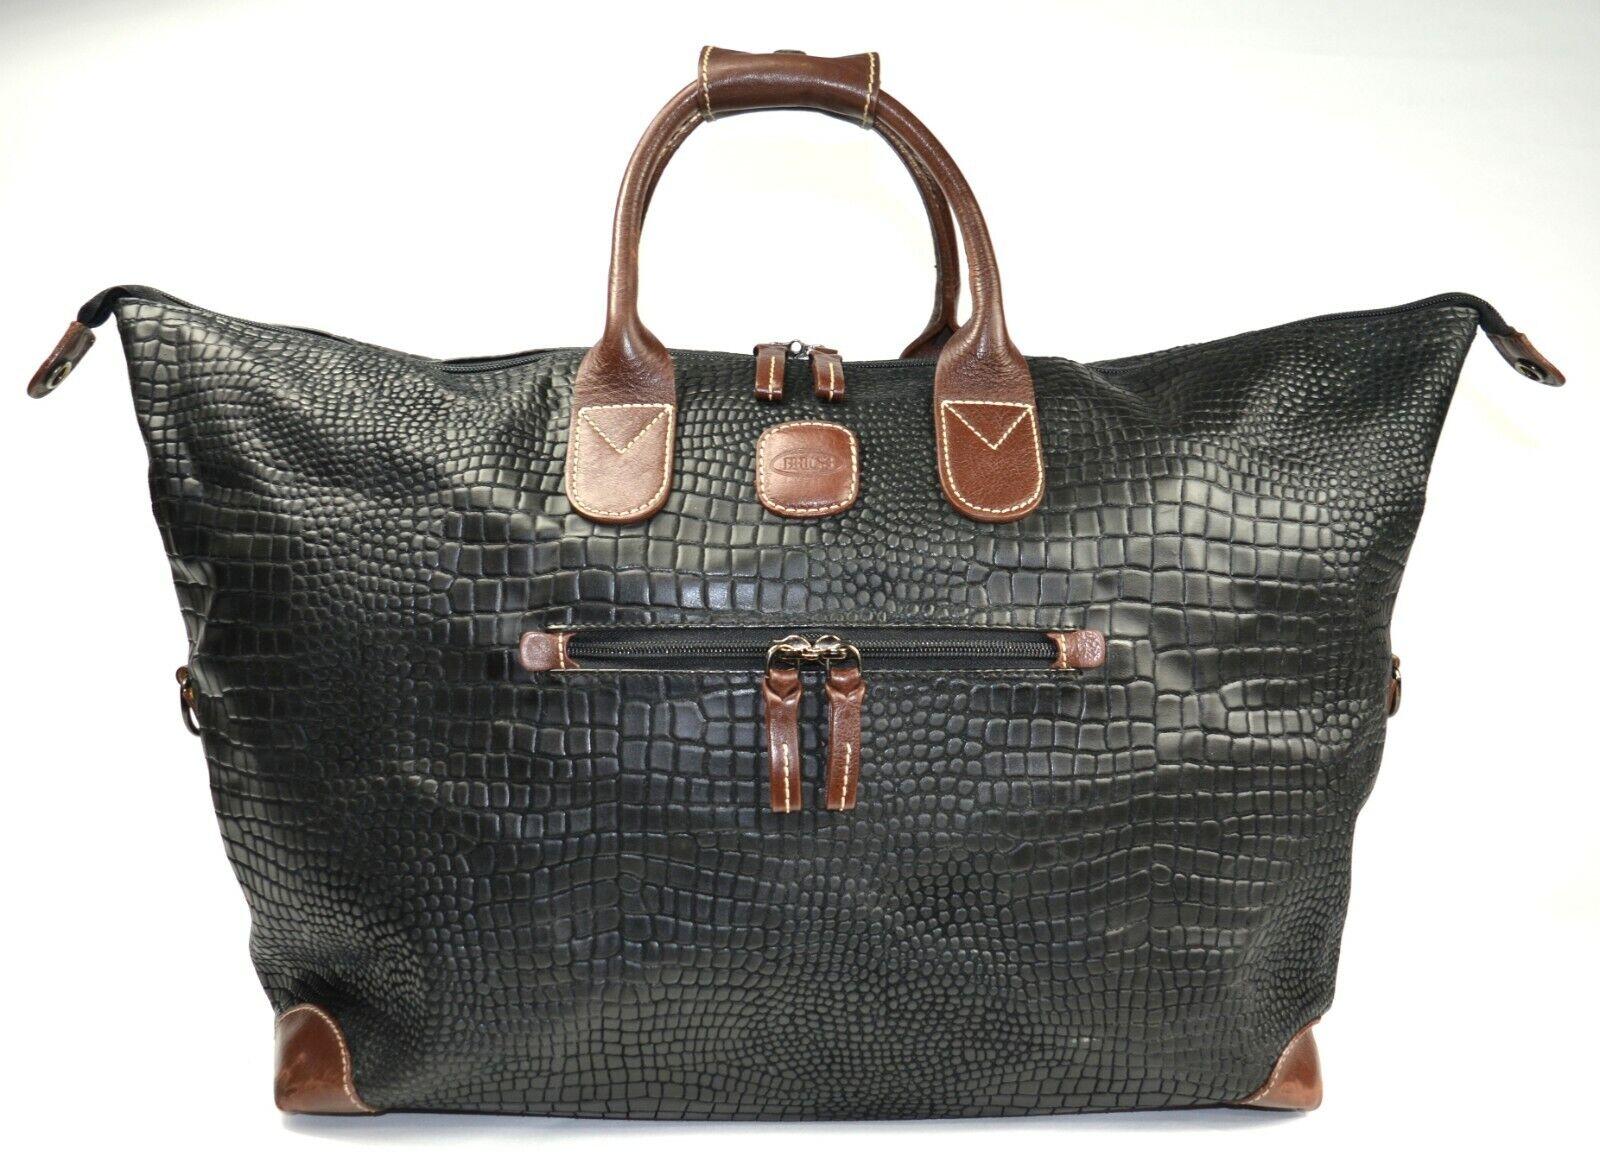 BRIC S Luggage My Safari 18 In. Crocodile-Embossed Cargo Duffel Black  - $100.99